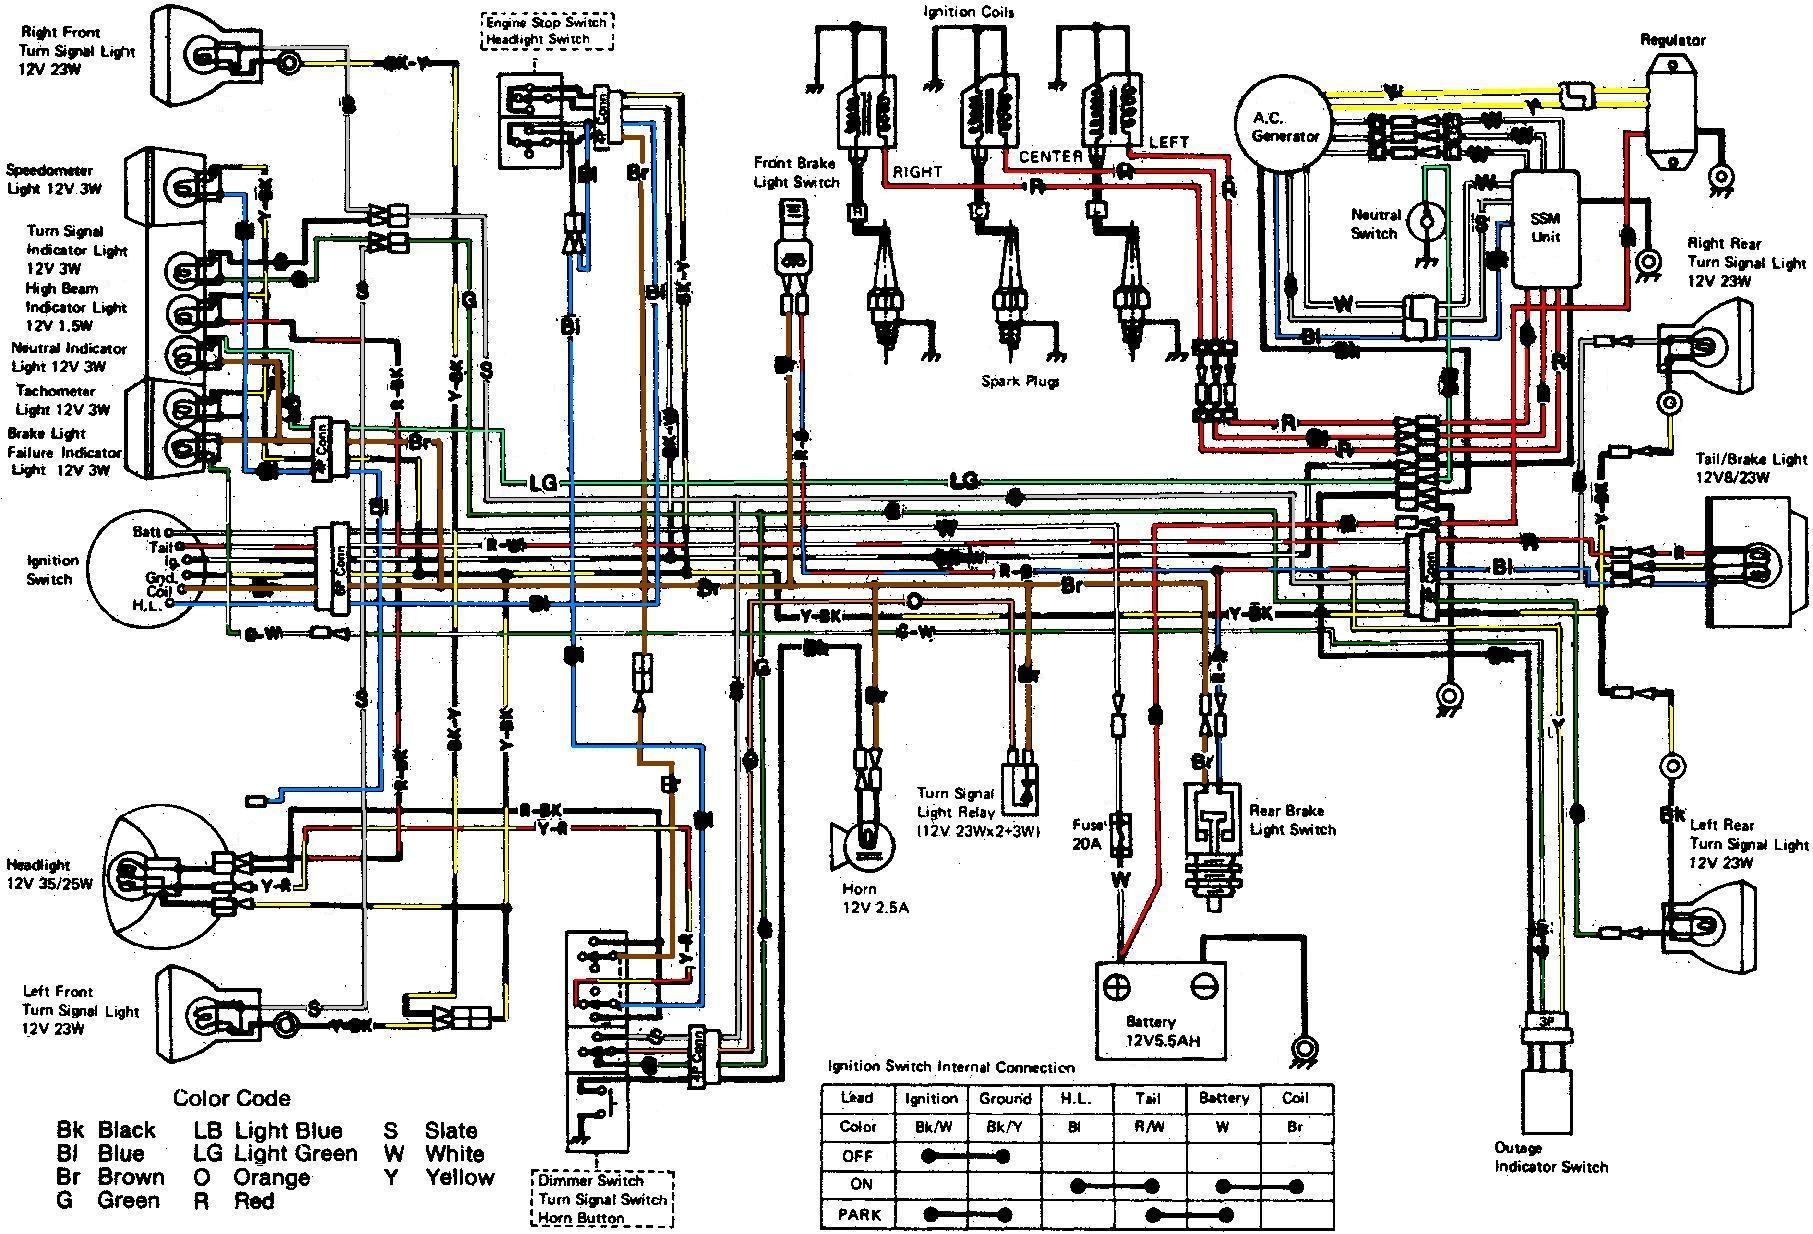 kawasaki bayou 220 wiring schematic Download-Wiring Diagram Kawasaki Bayou 220 2019 Wiring Diagram for Kawasaki Bayou 220 New Wiring Diagram 10 9-e